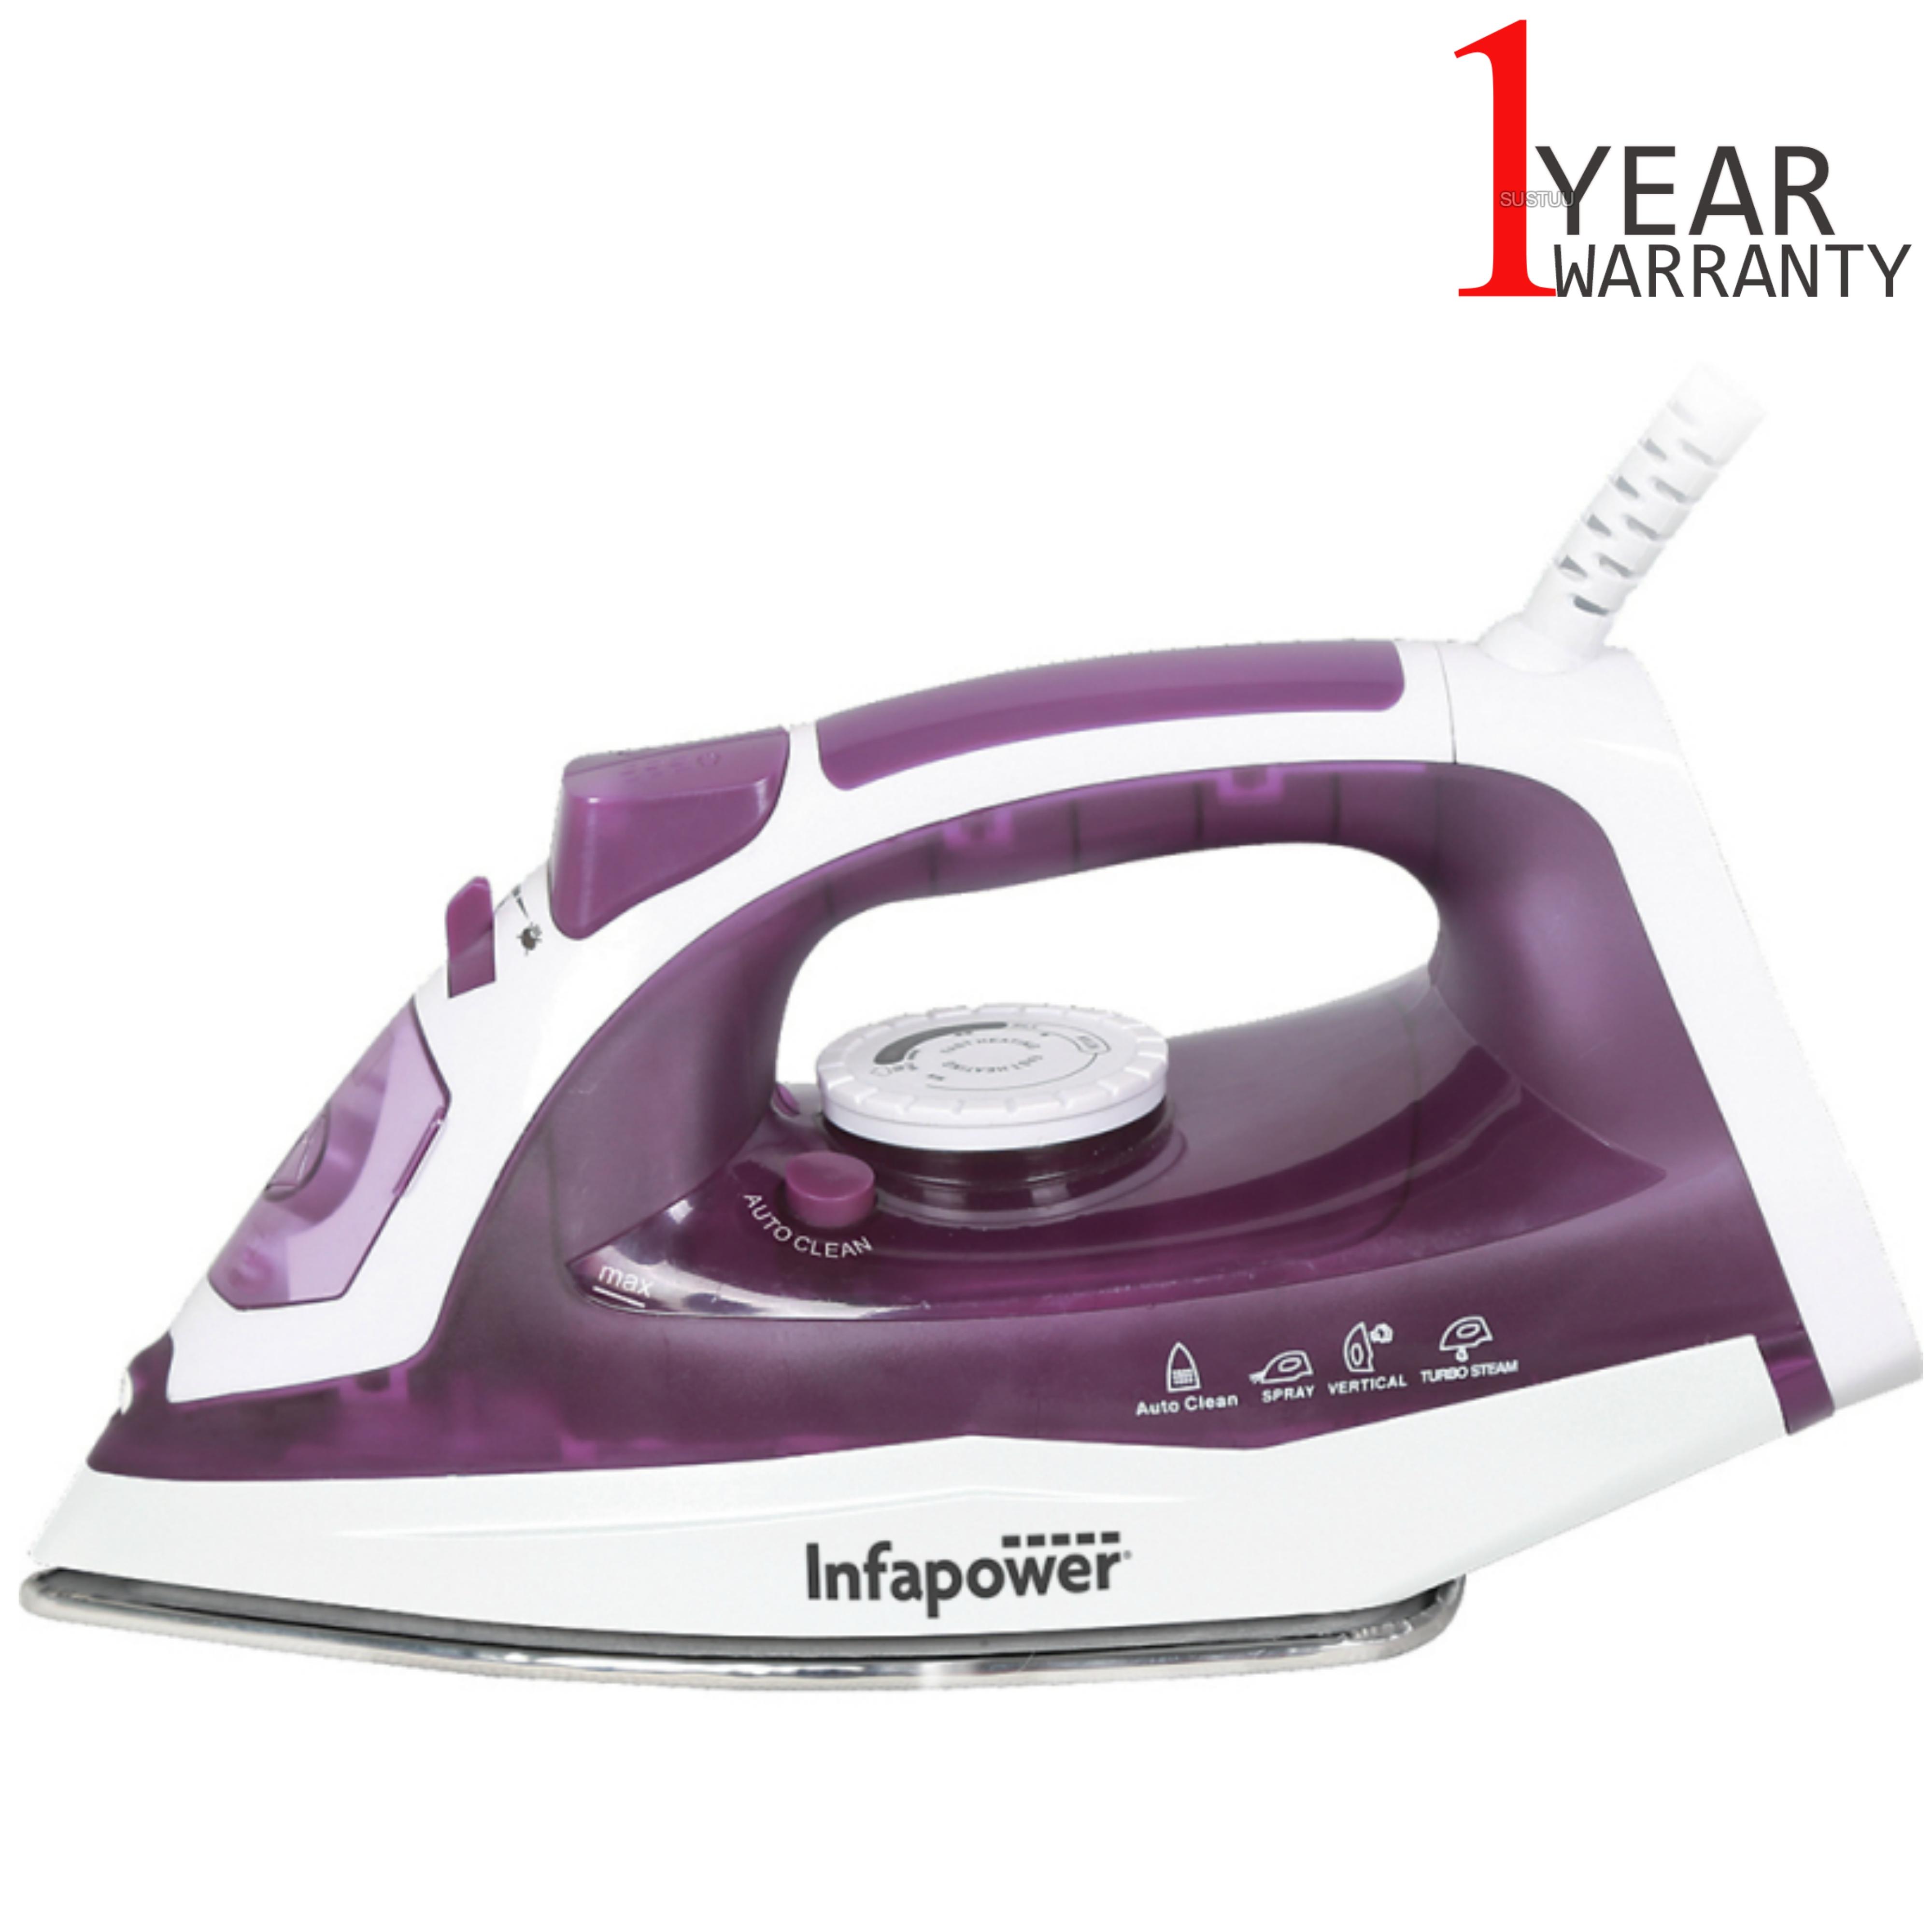 Infapower X603 Spray/Steam/Dry Iron?Self Clean | 2400W | Steel Soleplate | Purple | NEW